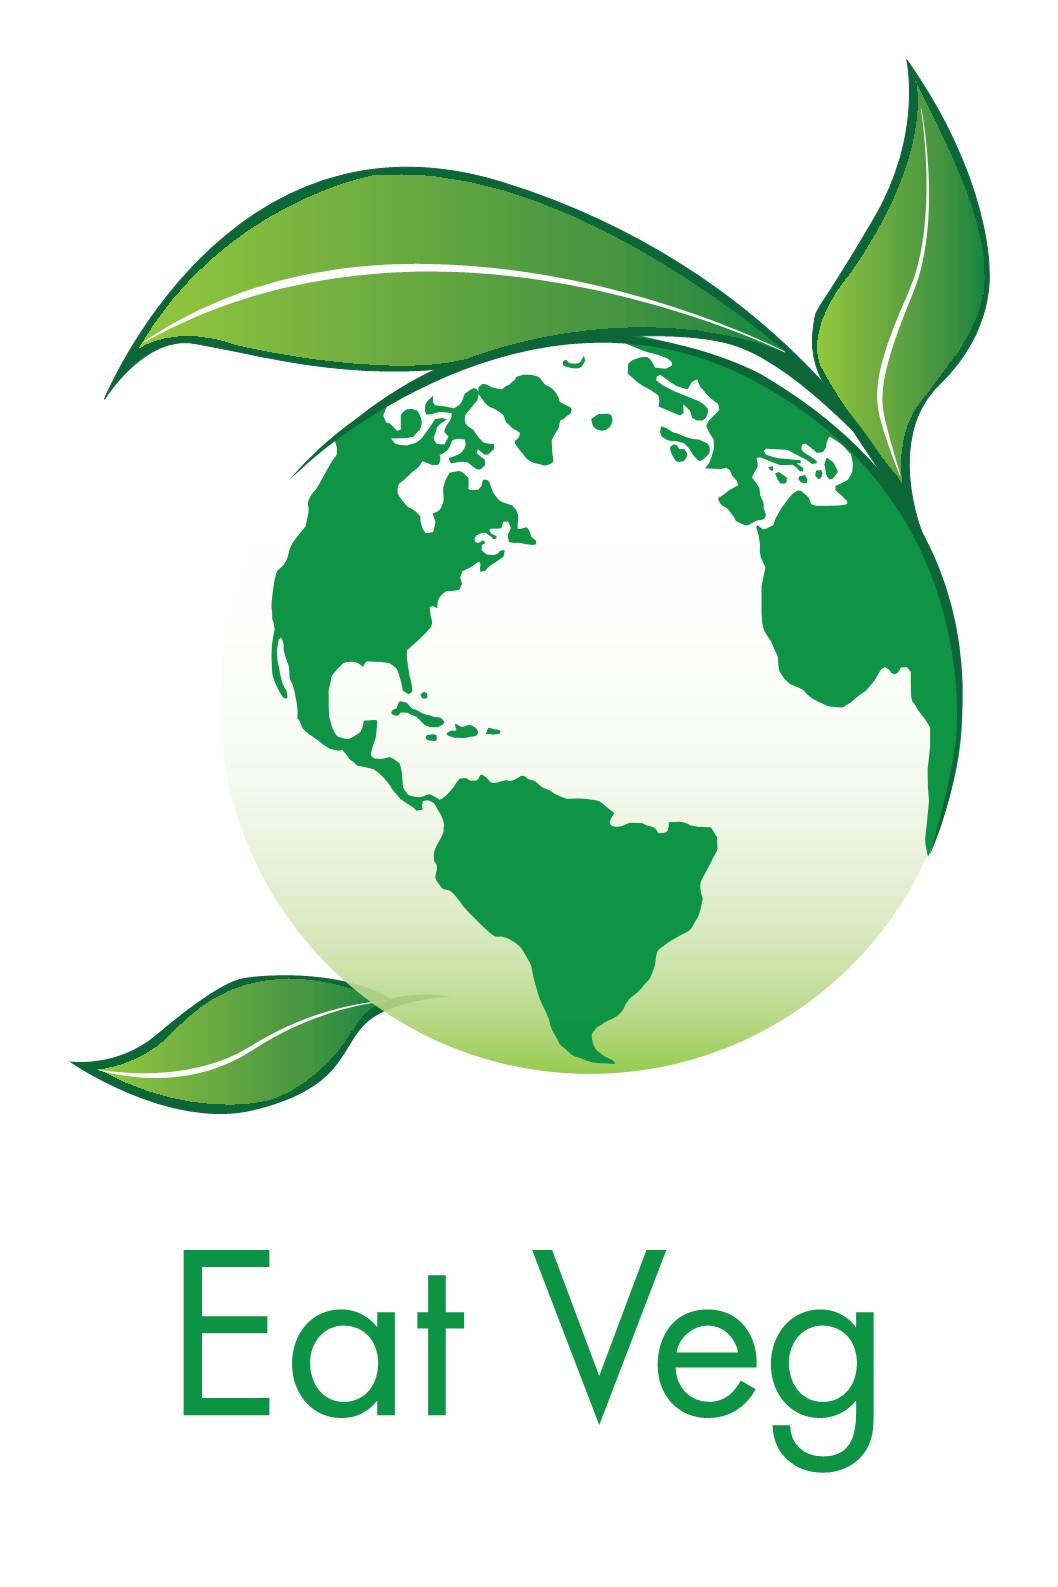 Eat Veg Srl - Latina